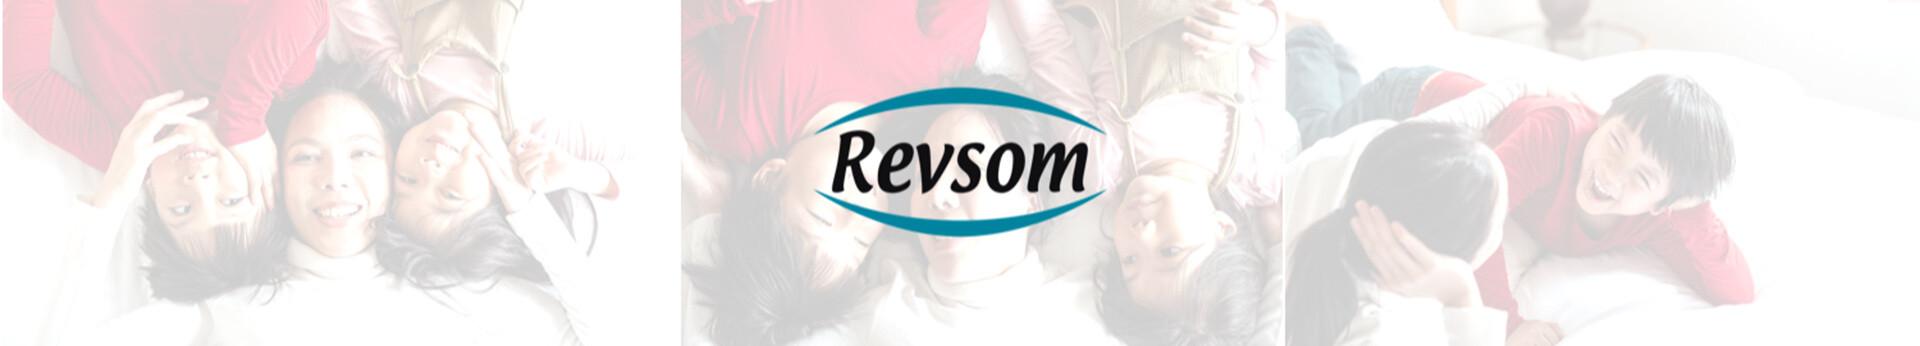 Revsom